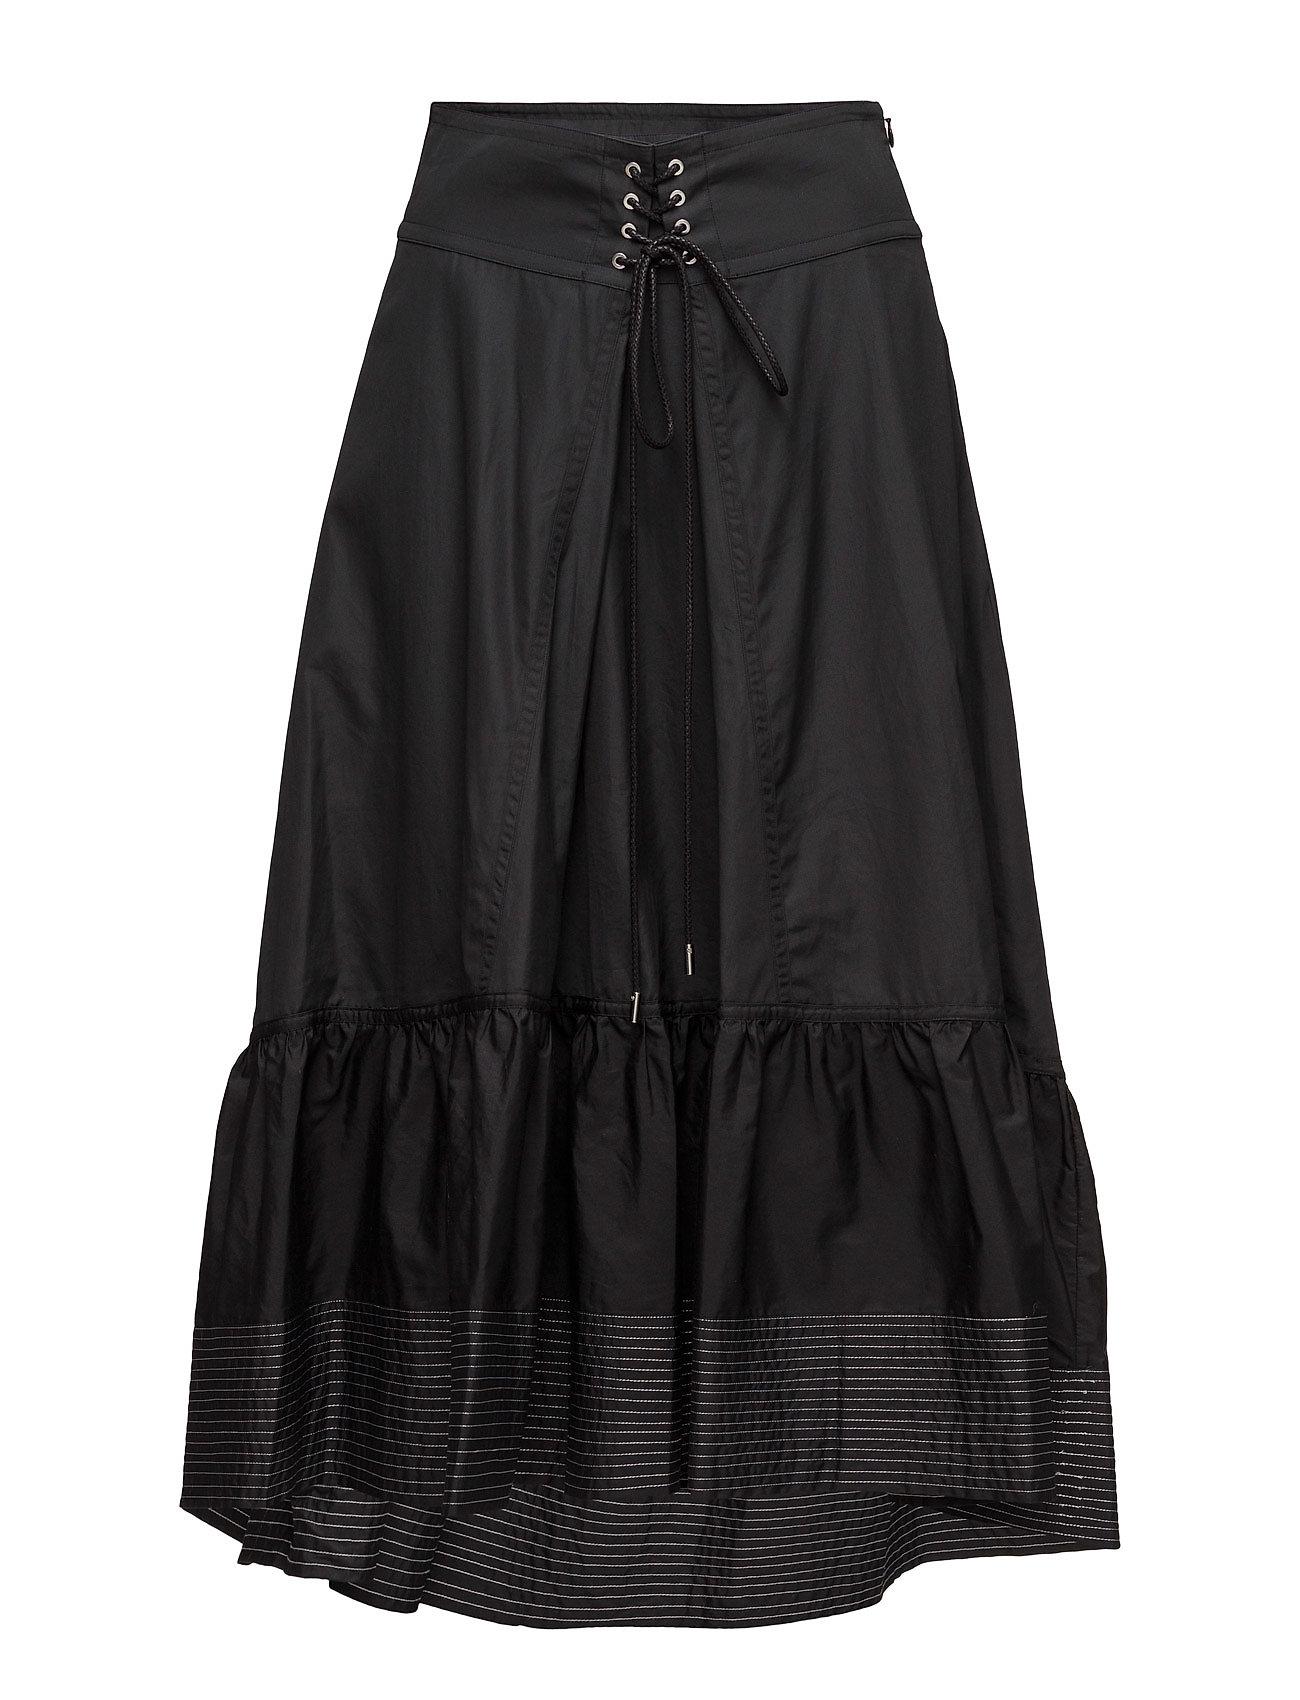 Skirt w victorian waist fra 3.1 phillip lim på boozt.com dk